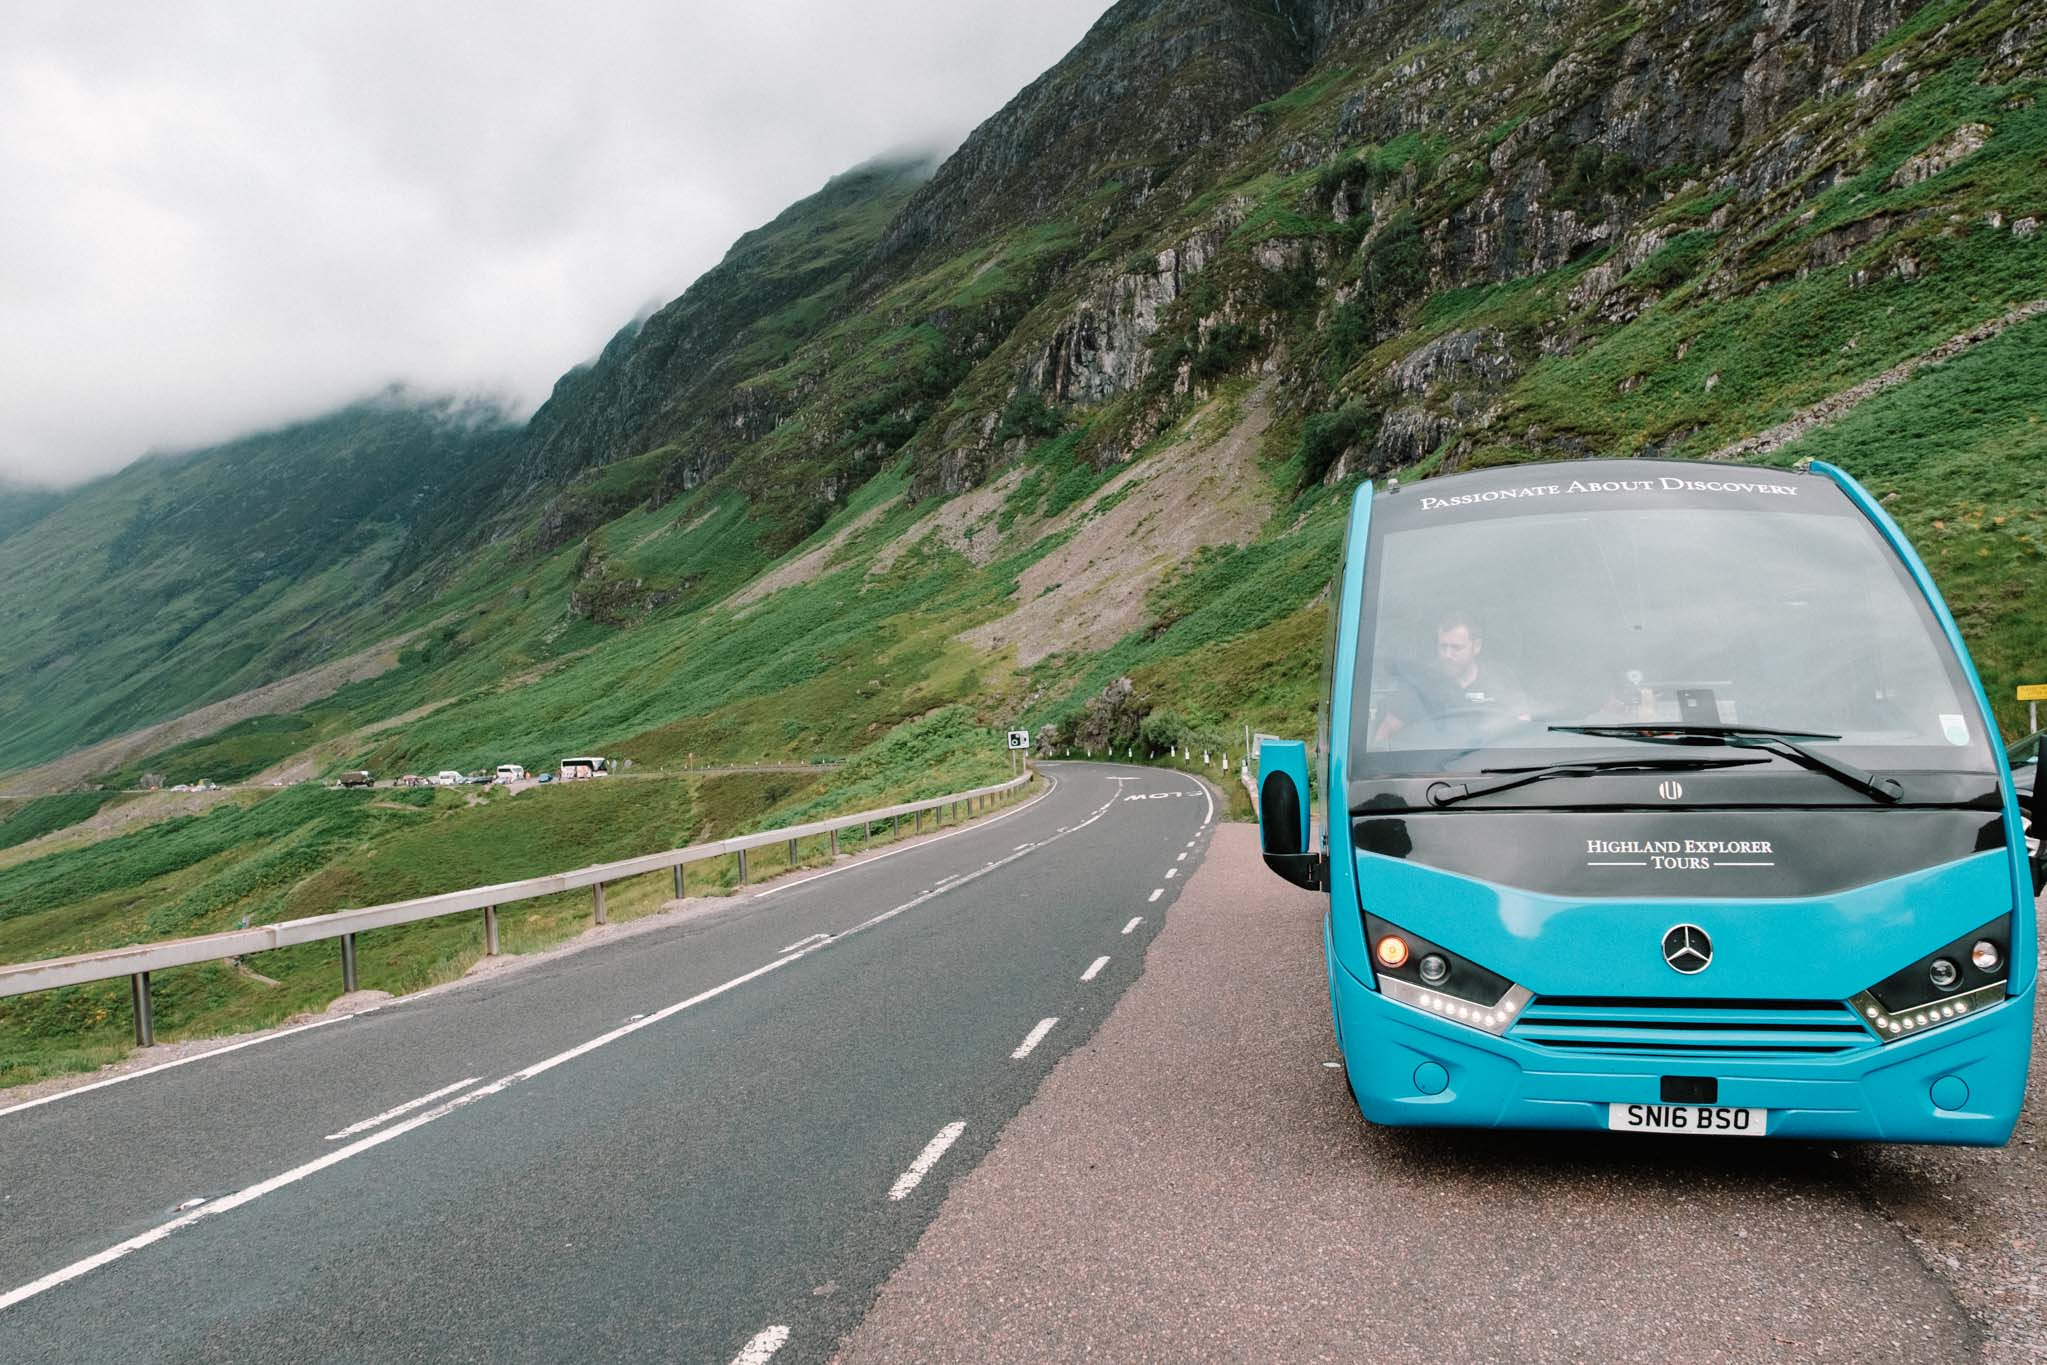 Highland Explorer Tours-160725-165229.jpg